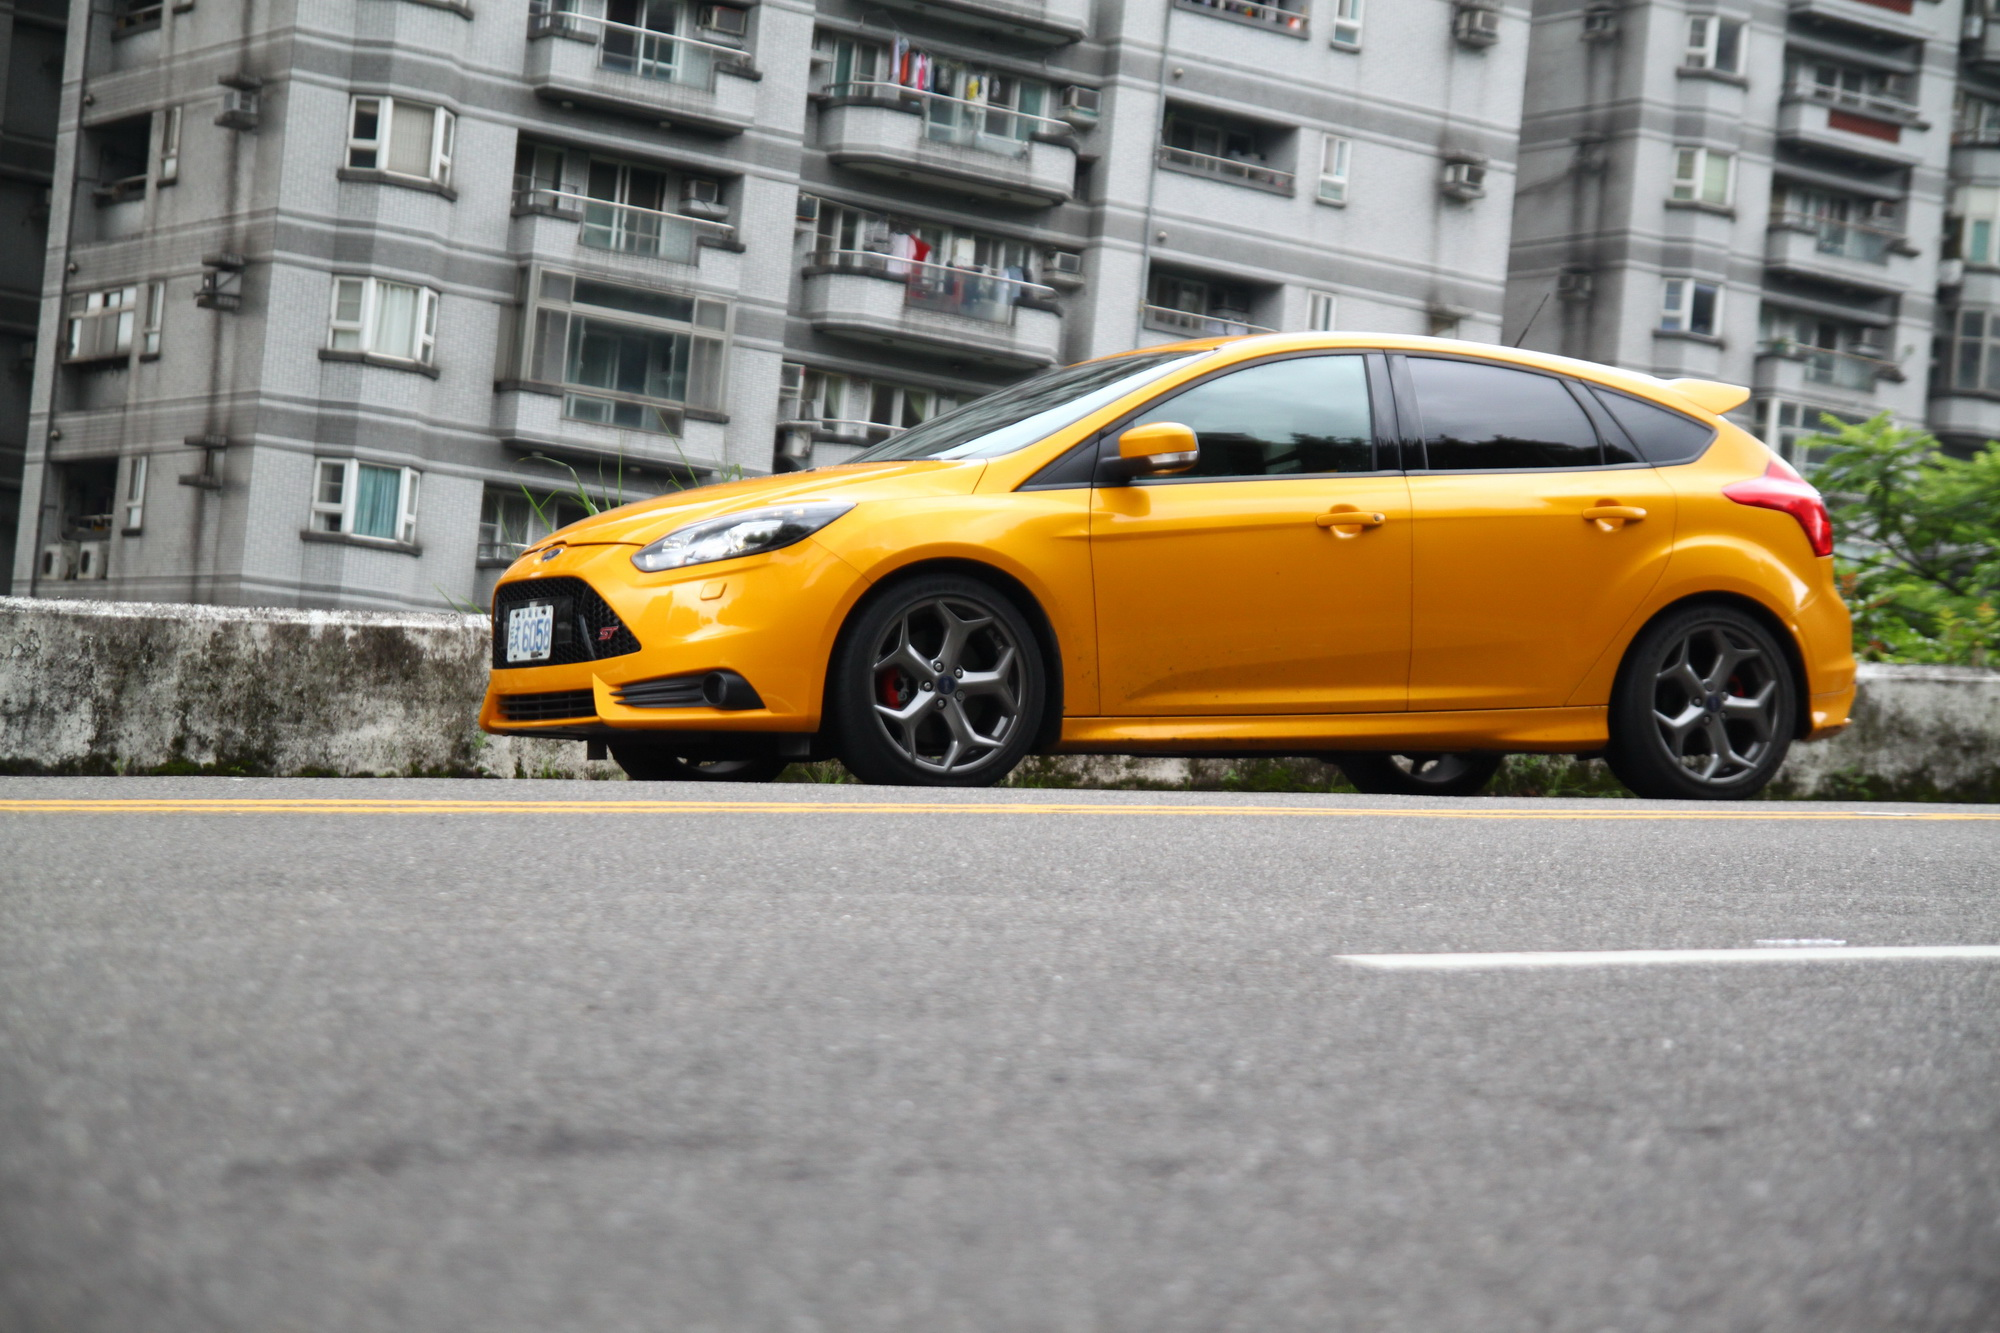 2013 Ford Focus ST 2.0 EcoBoost試駕!不用中大樂透,中統一發票就該牽這台